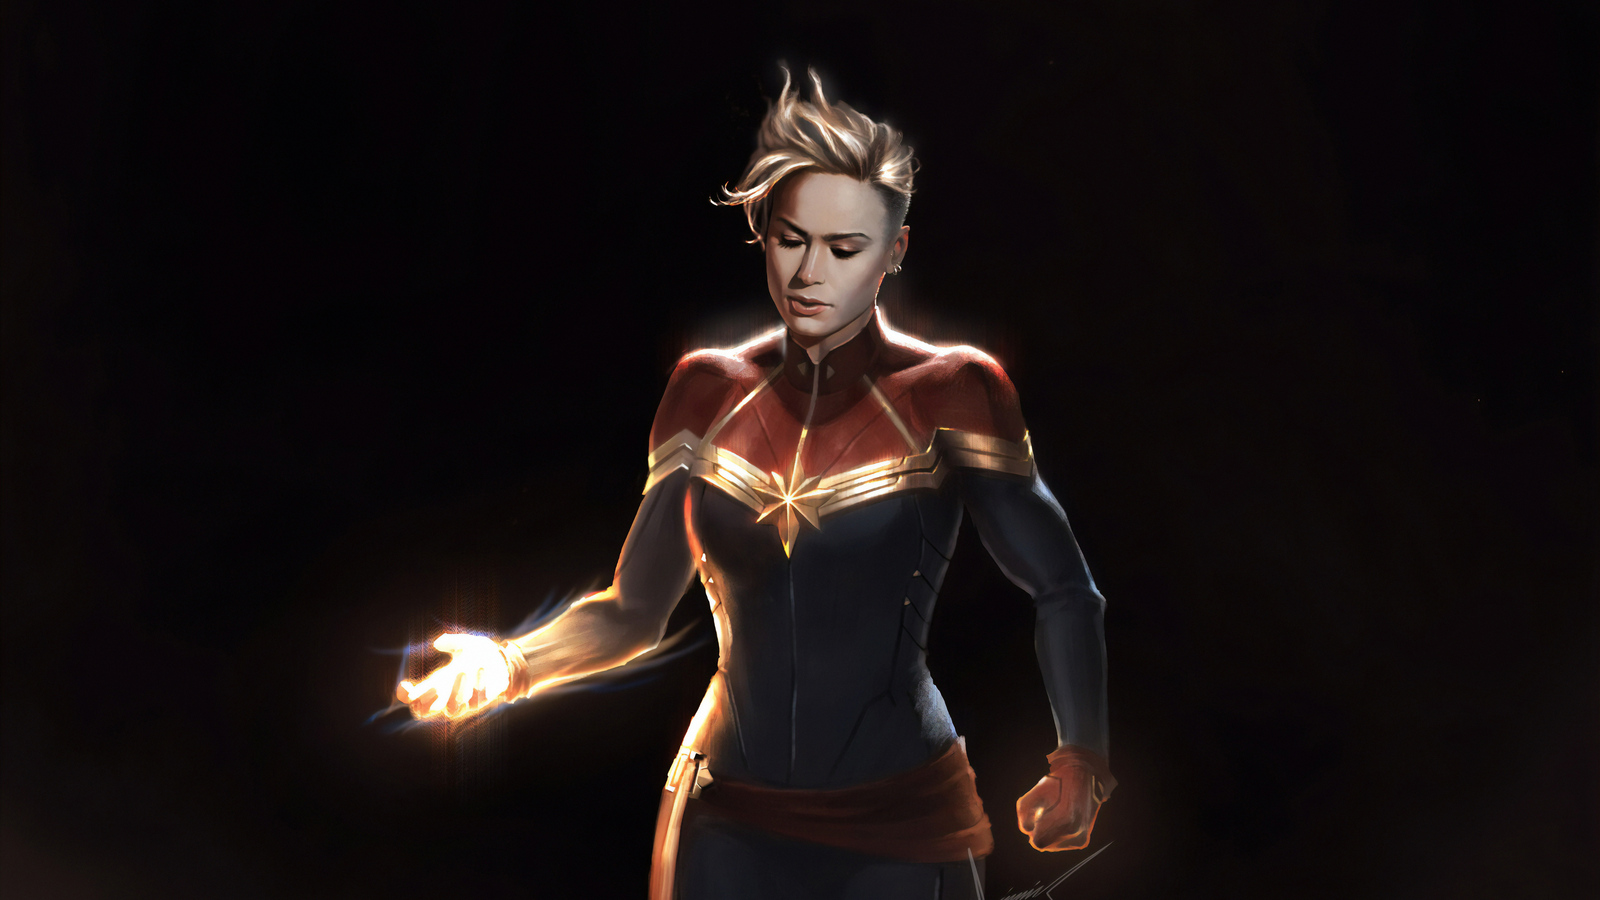 captain-marvel-4k-sketch-art-lb.jpg